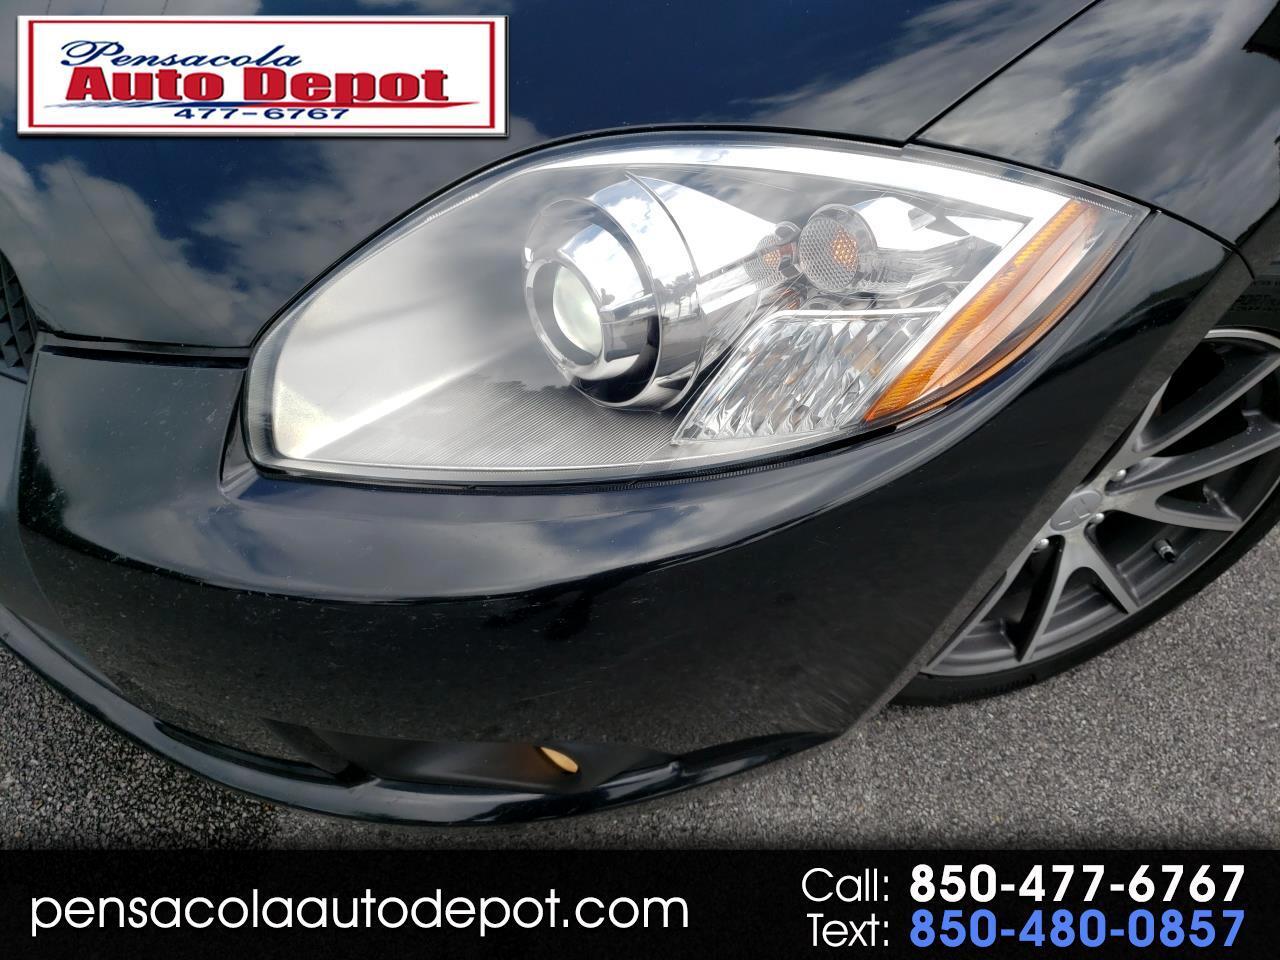 2010 Mitsubishi Eclipse GS Sport